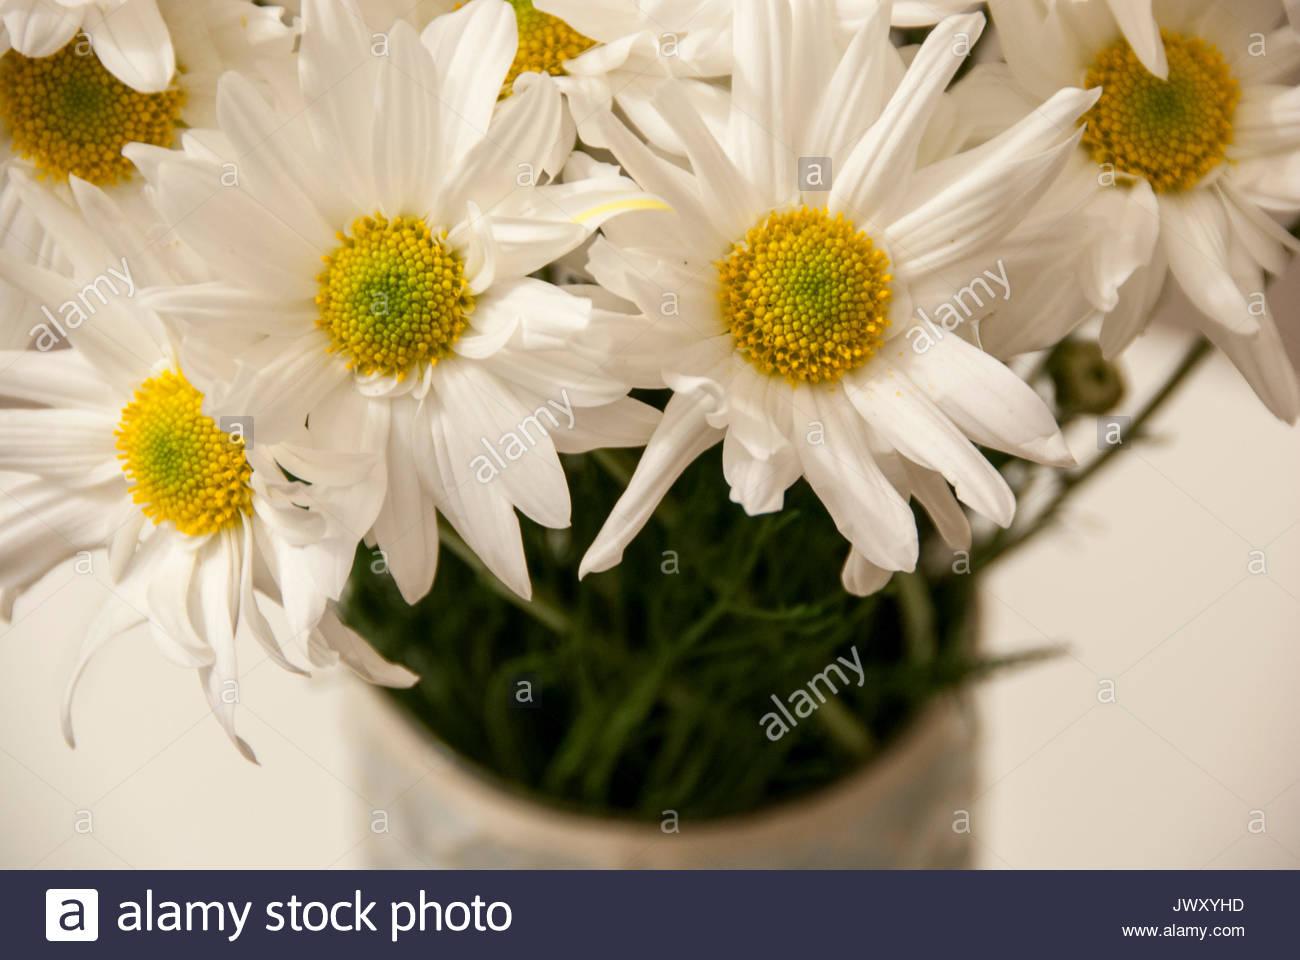 Yellow daisies in vase stock photos yellow daisies in vase stock daisies in a vase stock image reviewsmspy